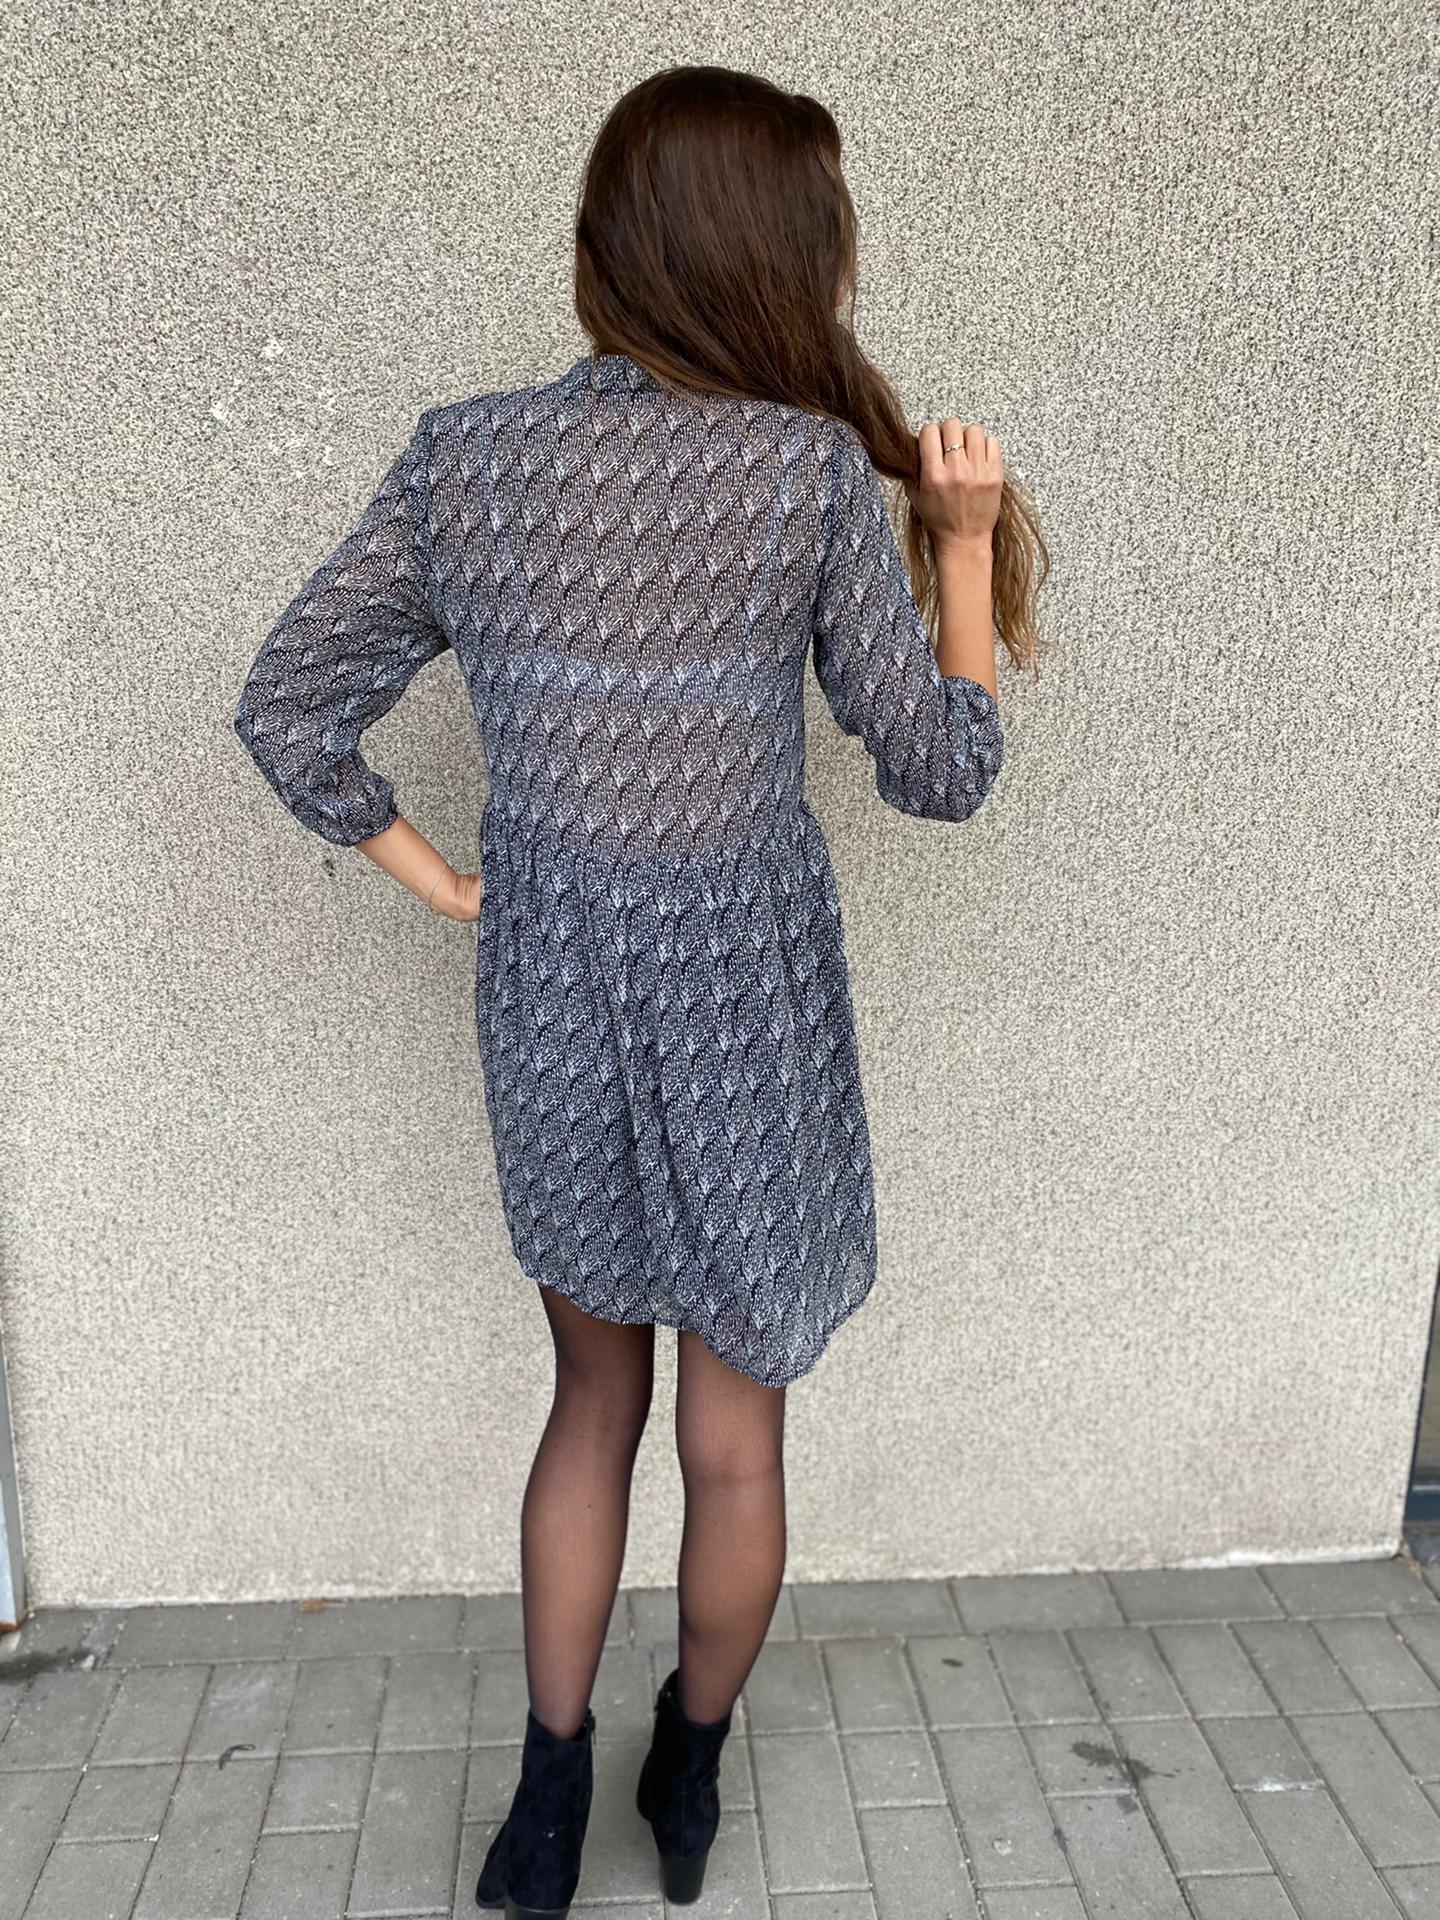 PEPITES robe cindy noir-4